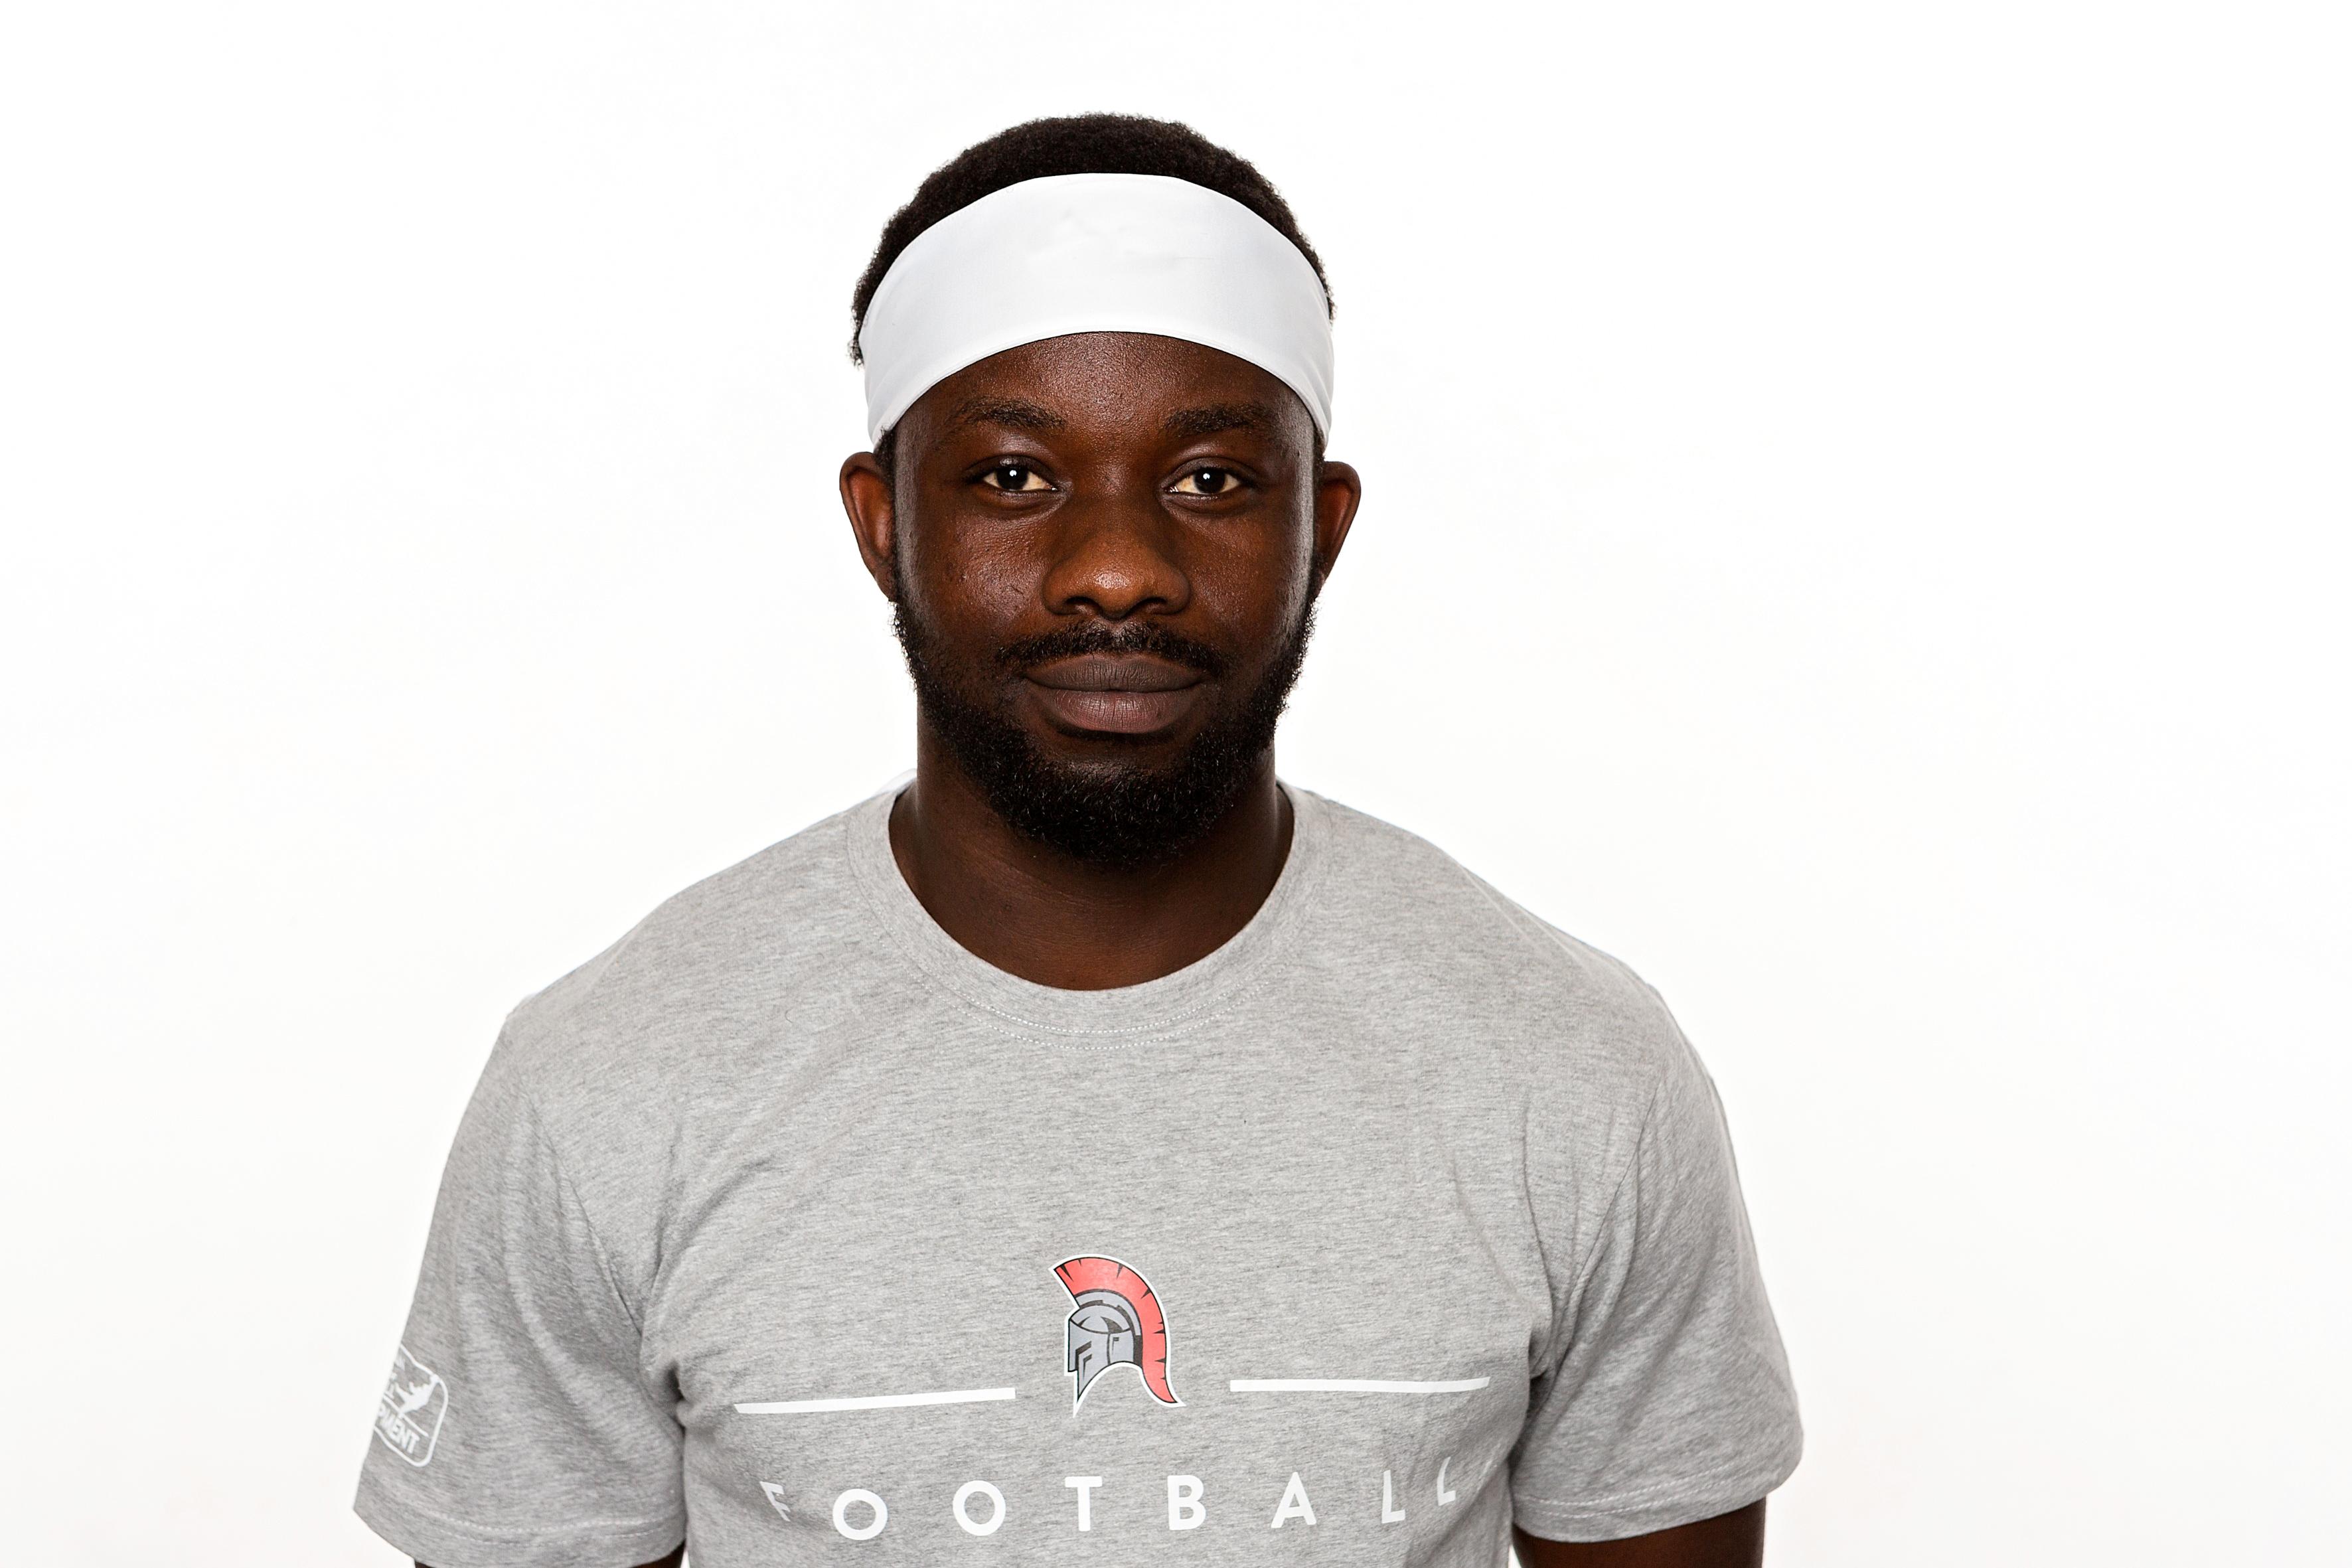 Michael Ofosuhene